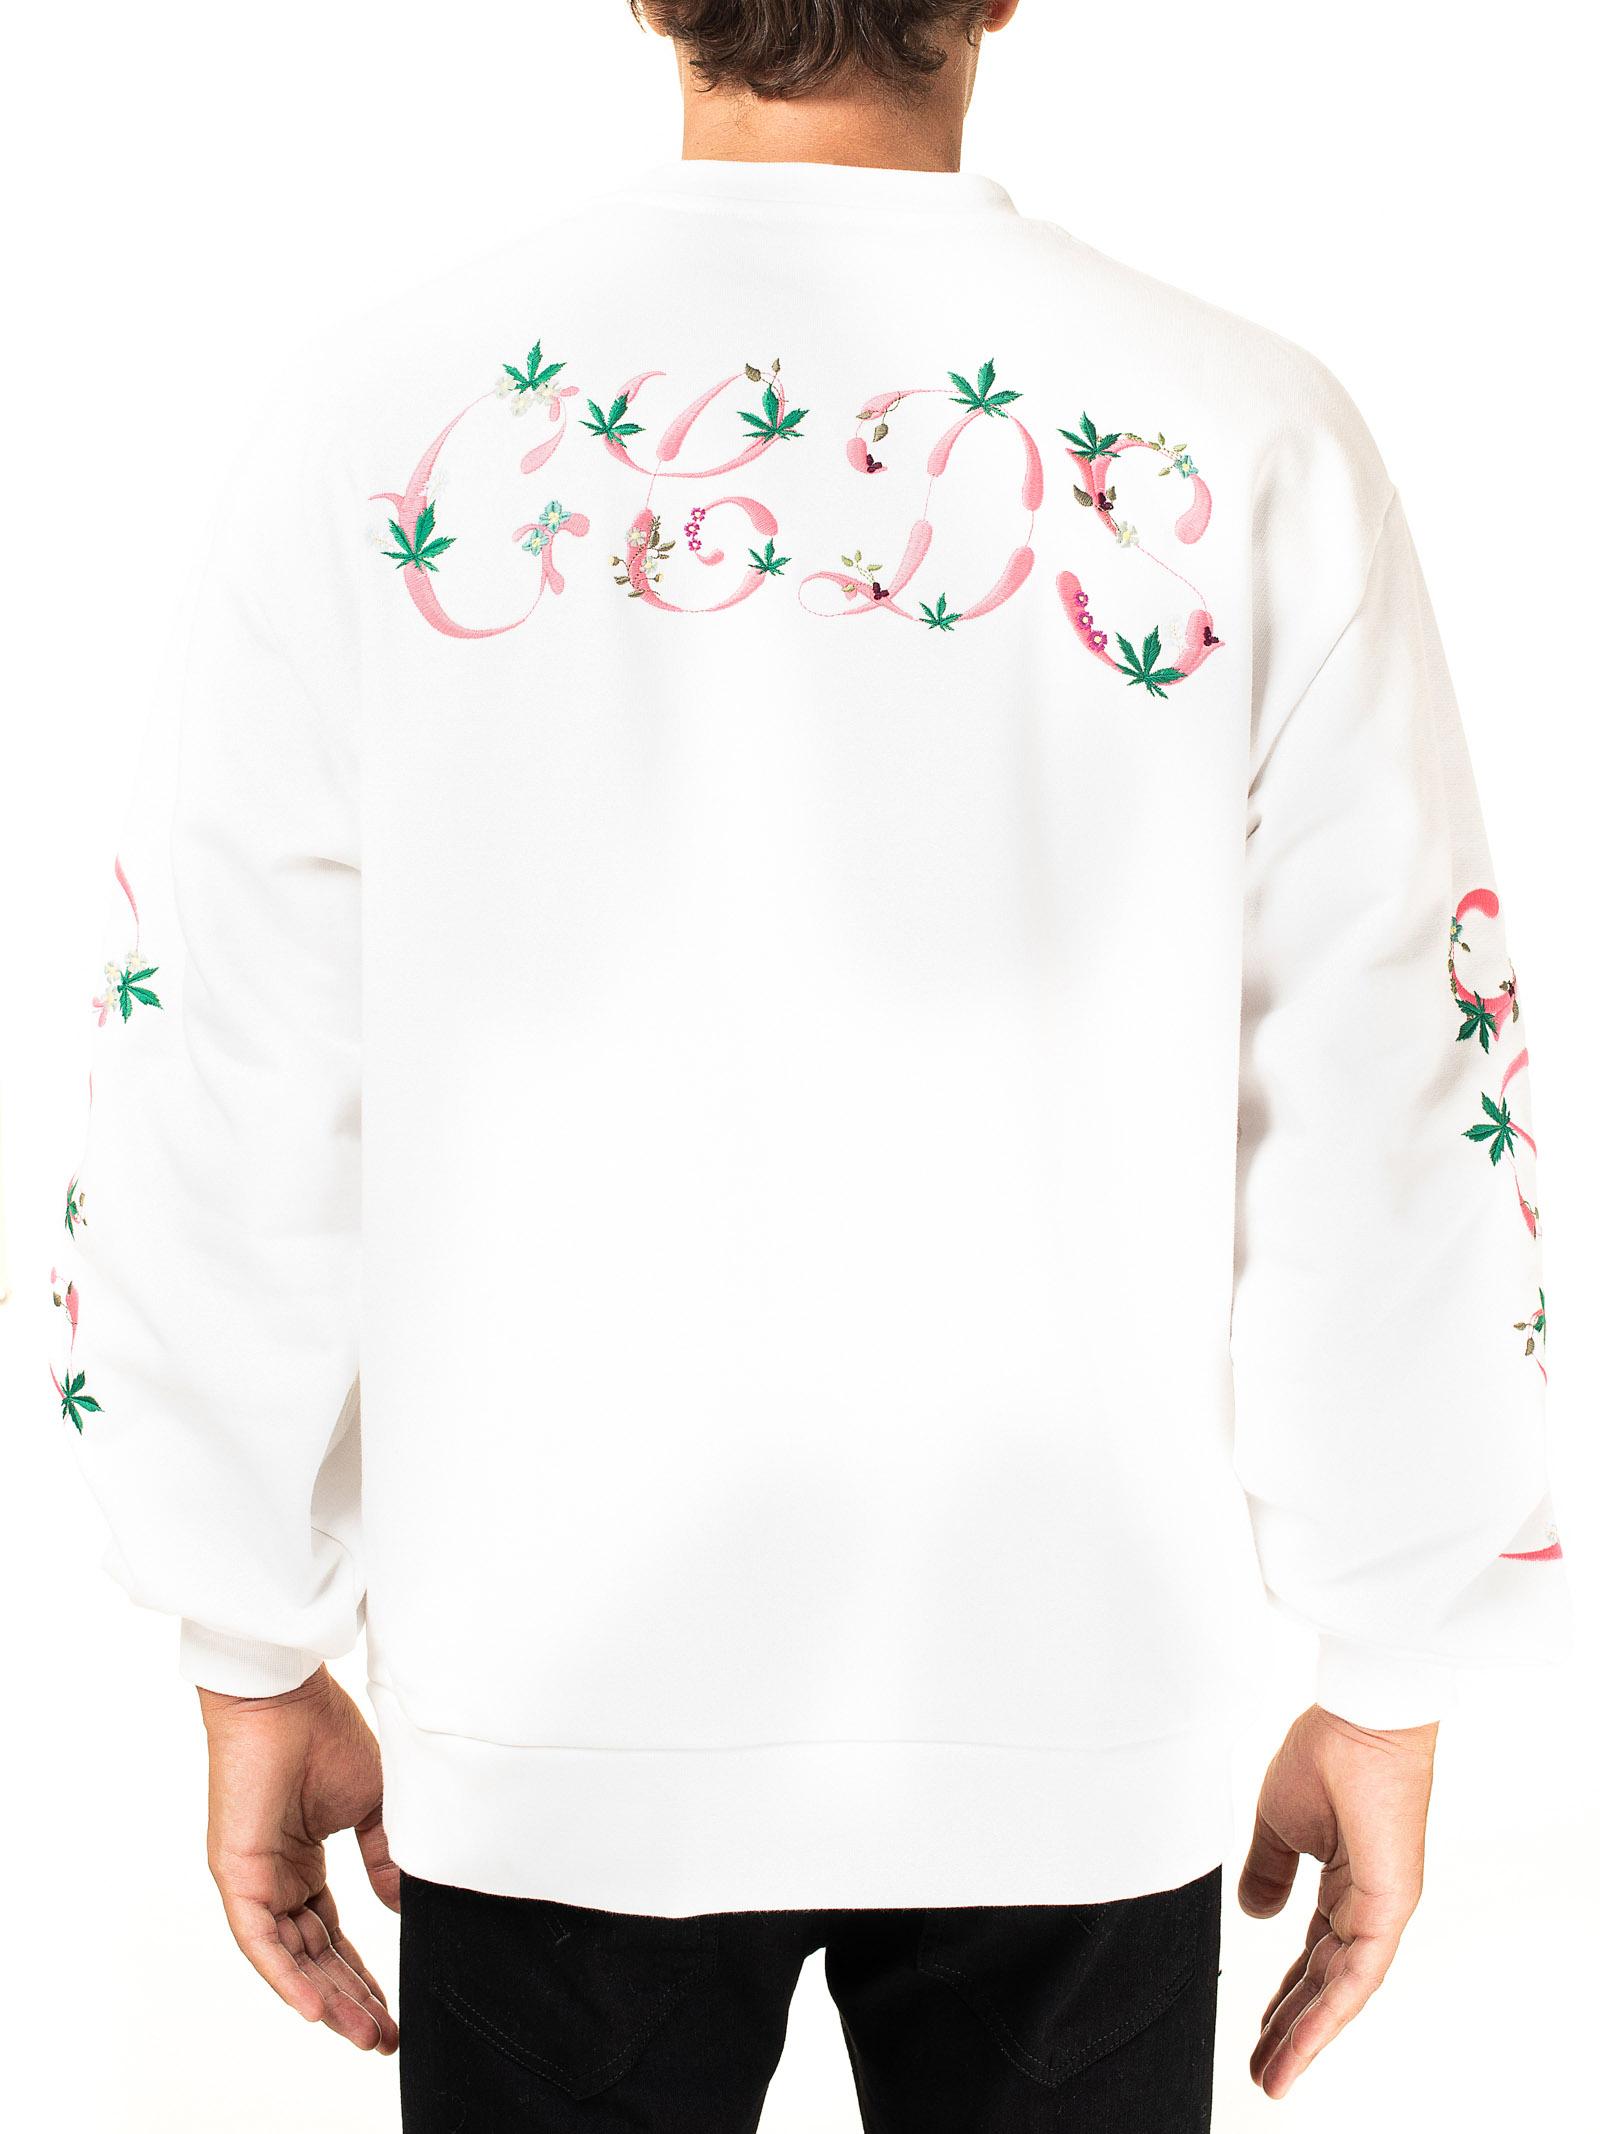 WHITE COTTON SWEATSHIRT WITH GIULYCOUTURE SCOOP NECK GCDS | Sweatshirts | FW21M020104BIANCO